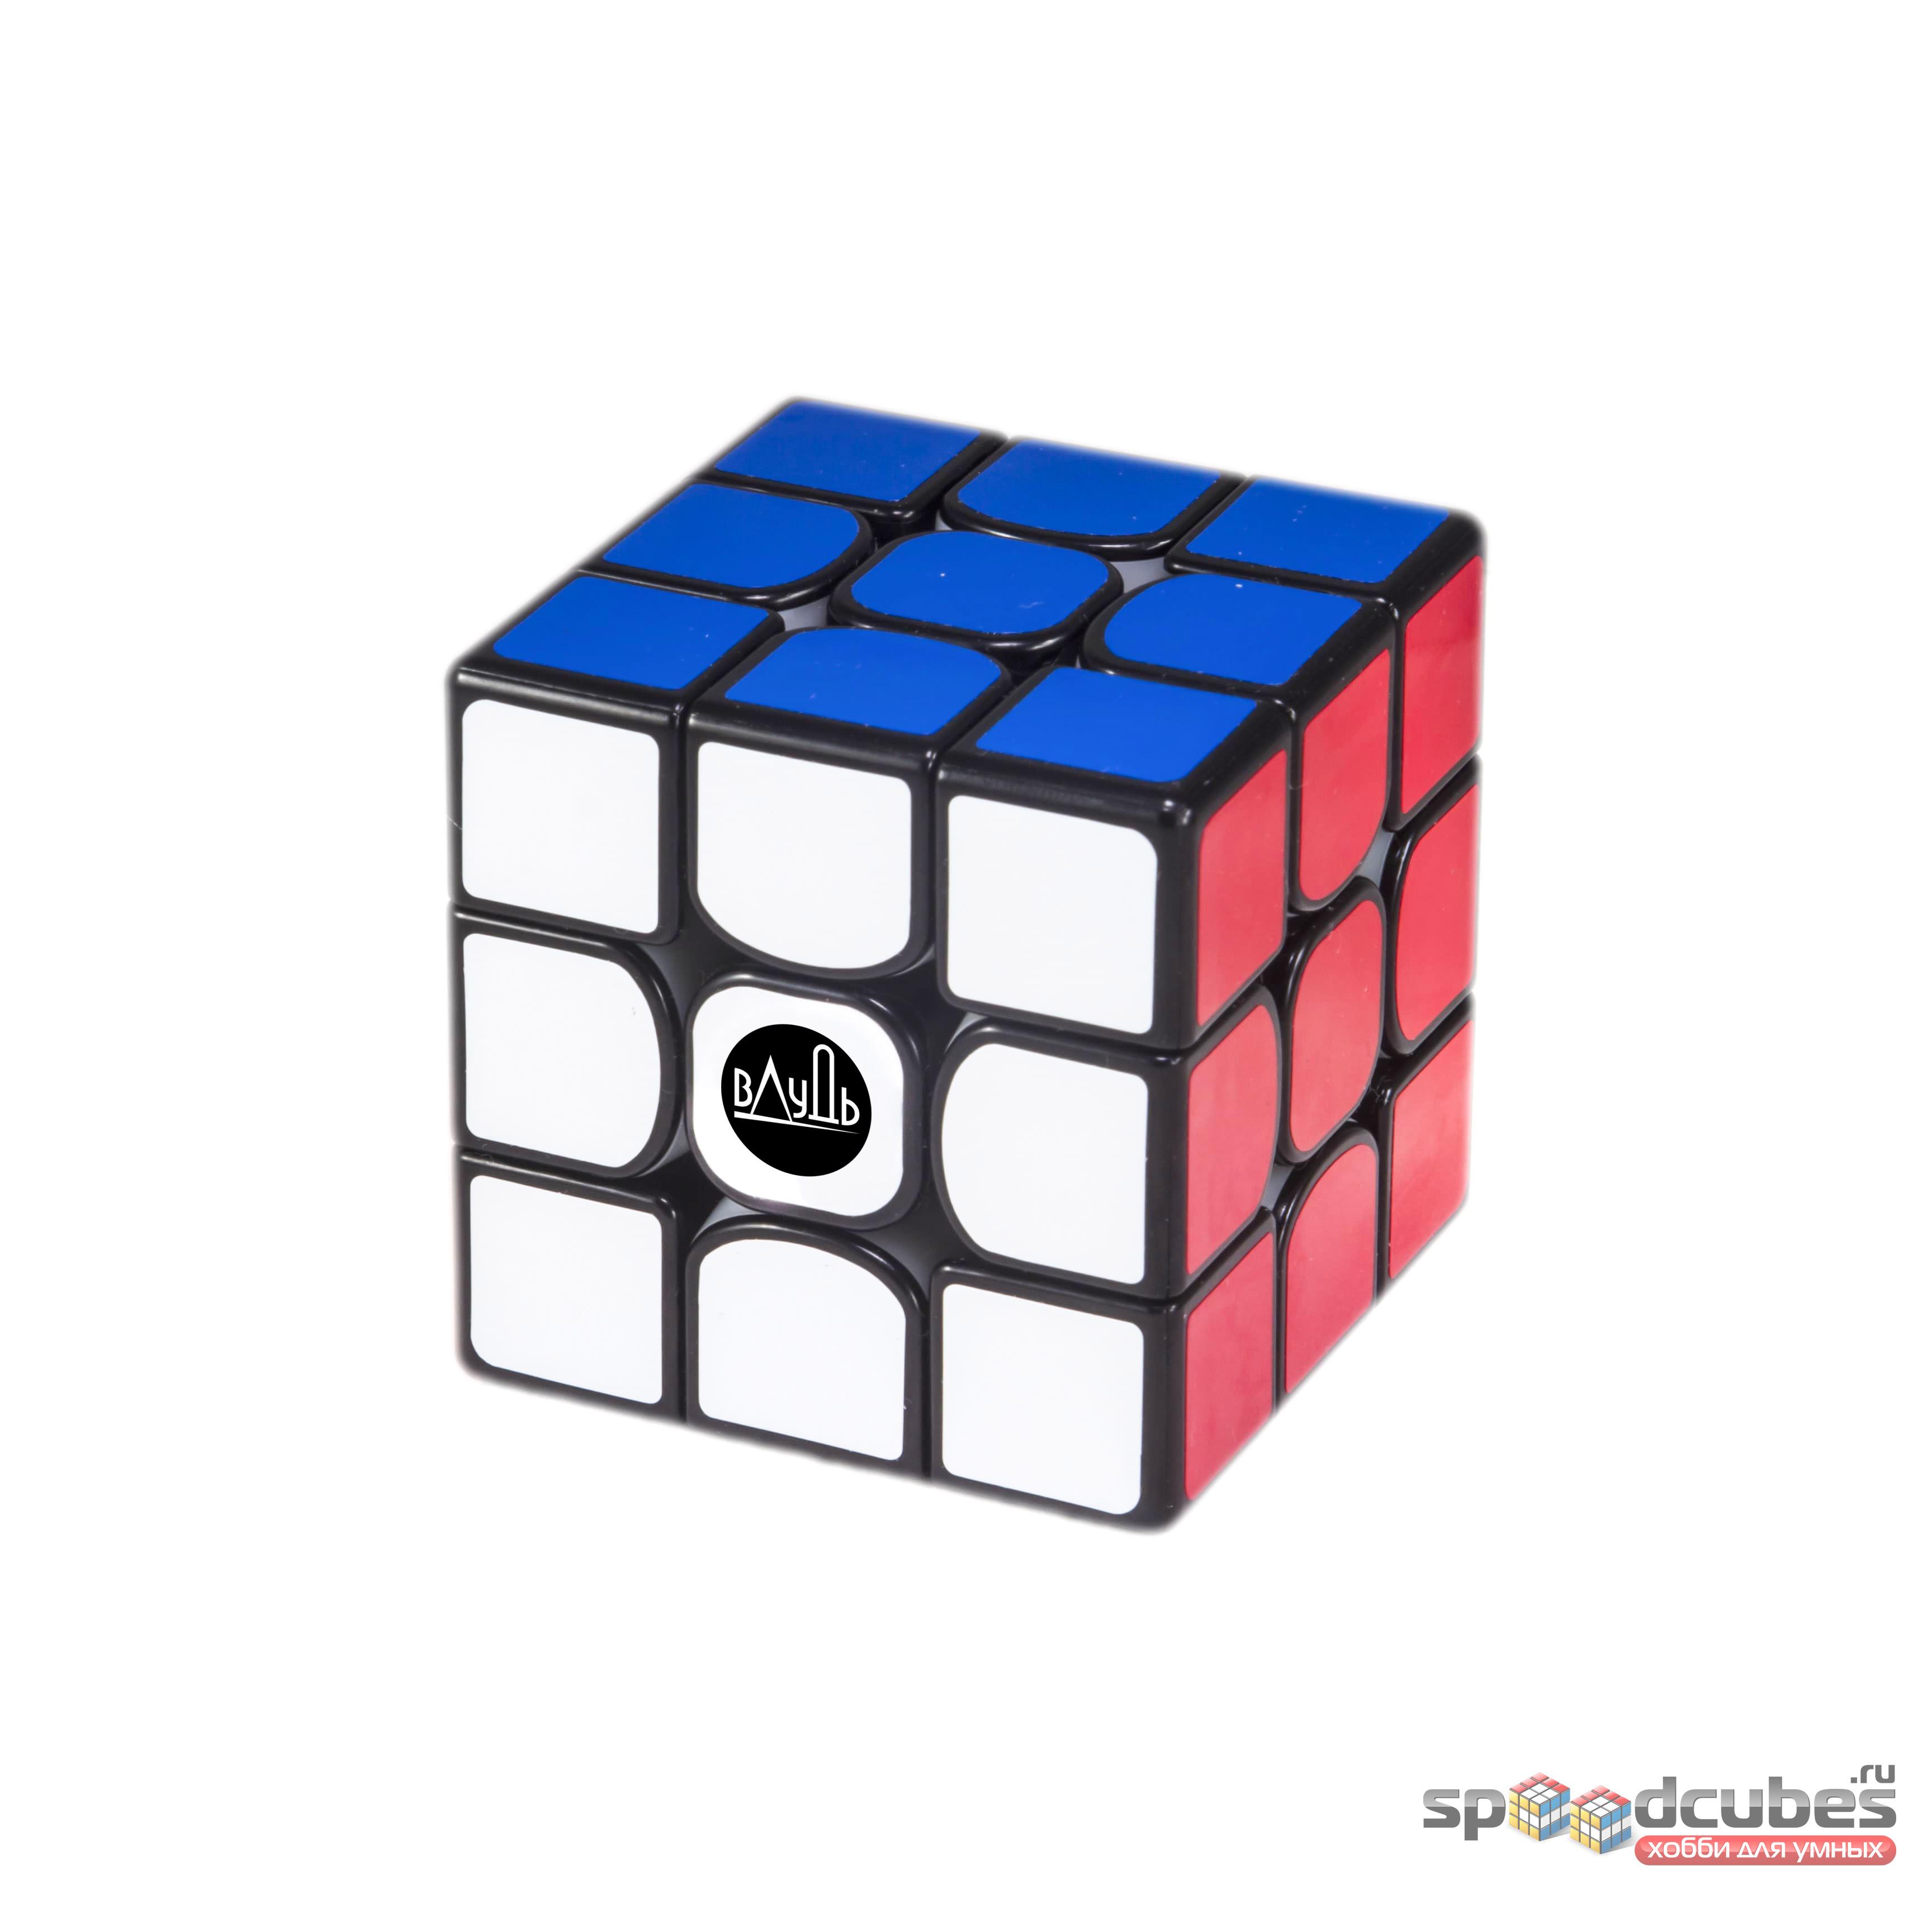 Стикер на кубик «вДудь»